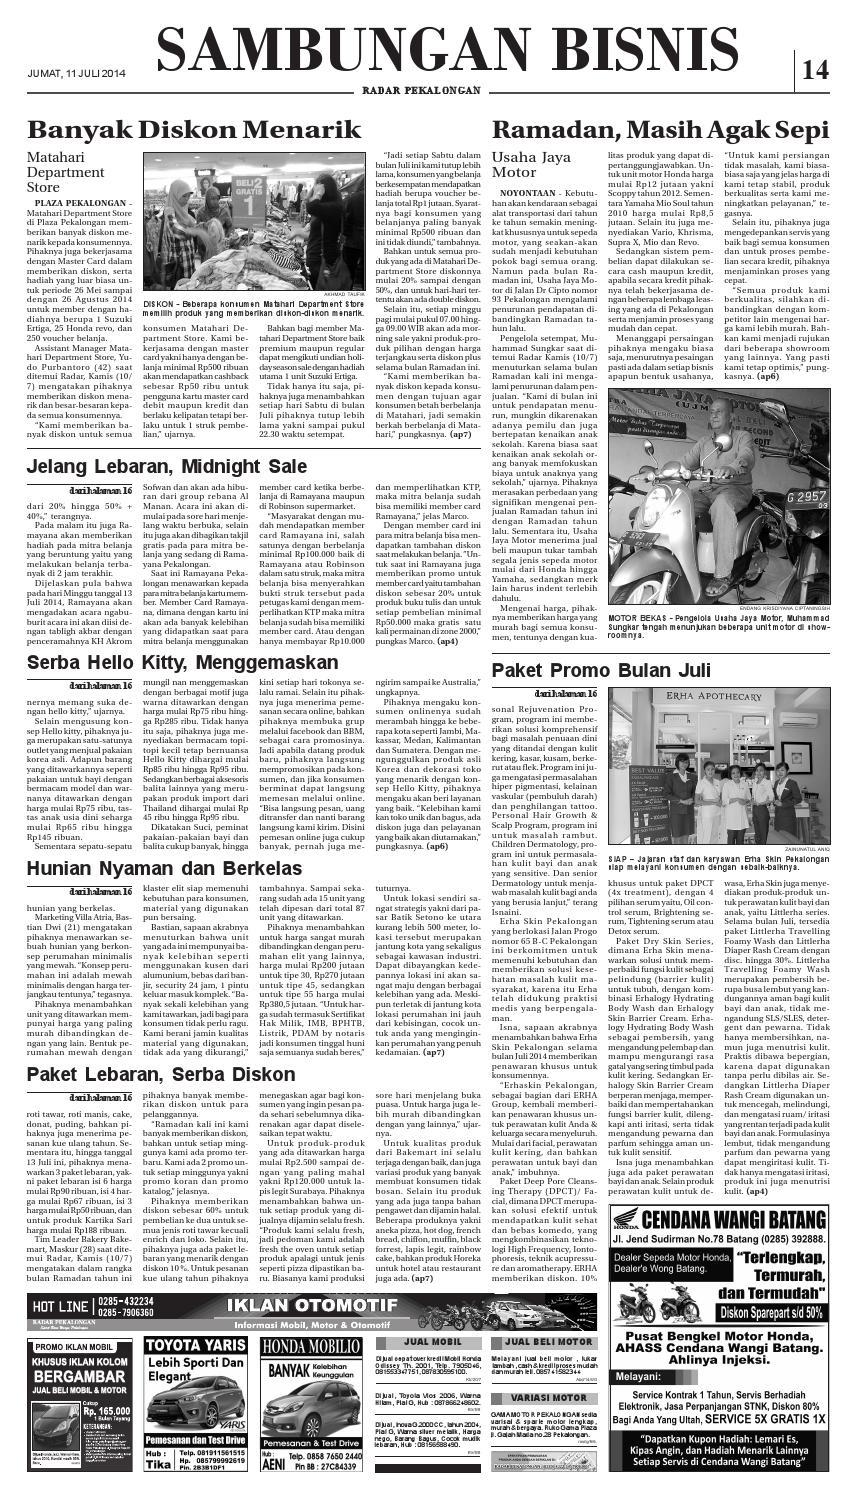 Radar pekalongan 11 juli 2014 by Radar Pekalongan - issuu 910f3543b8